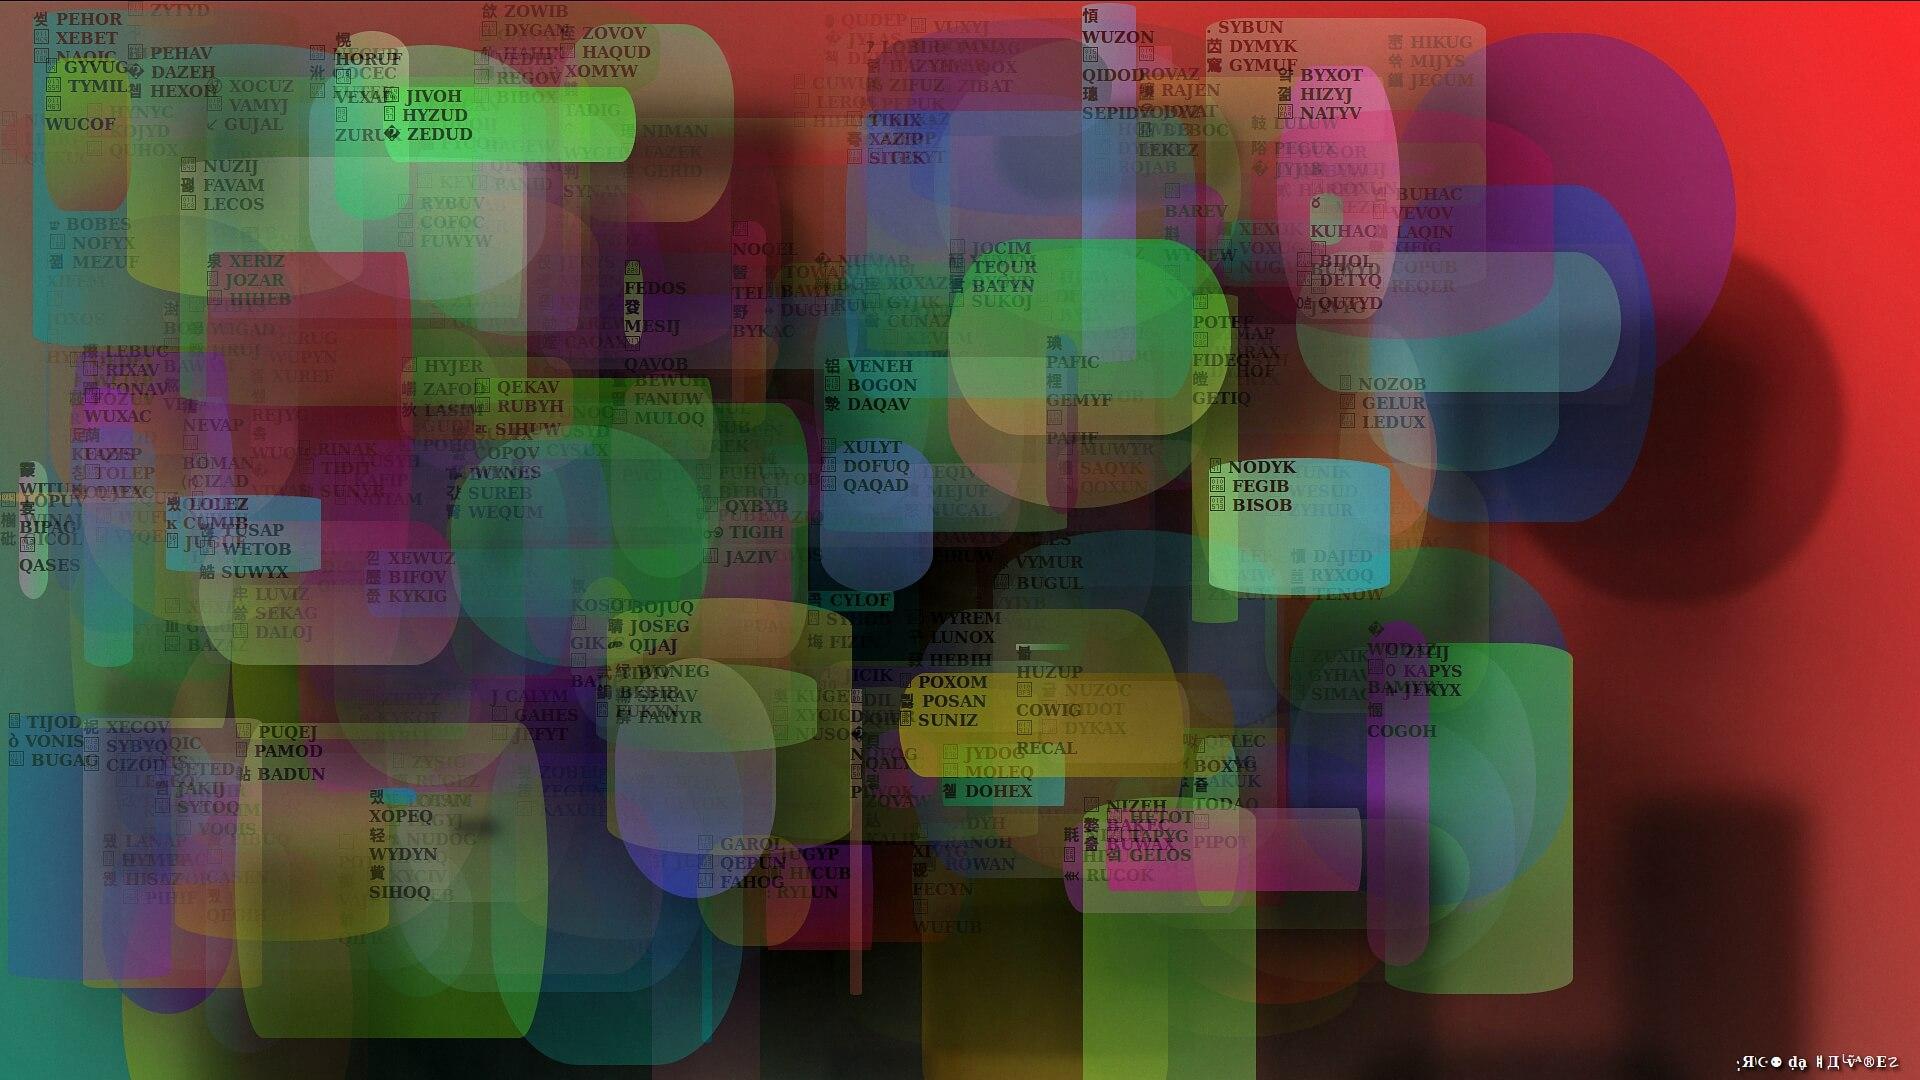 Rico da Halvarez : YADT (Yet Another Determinism Tool)